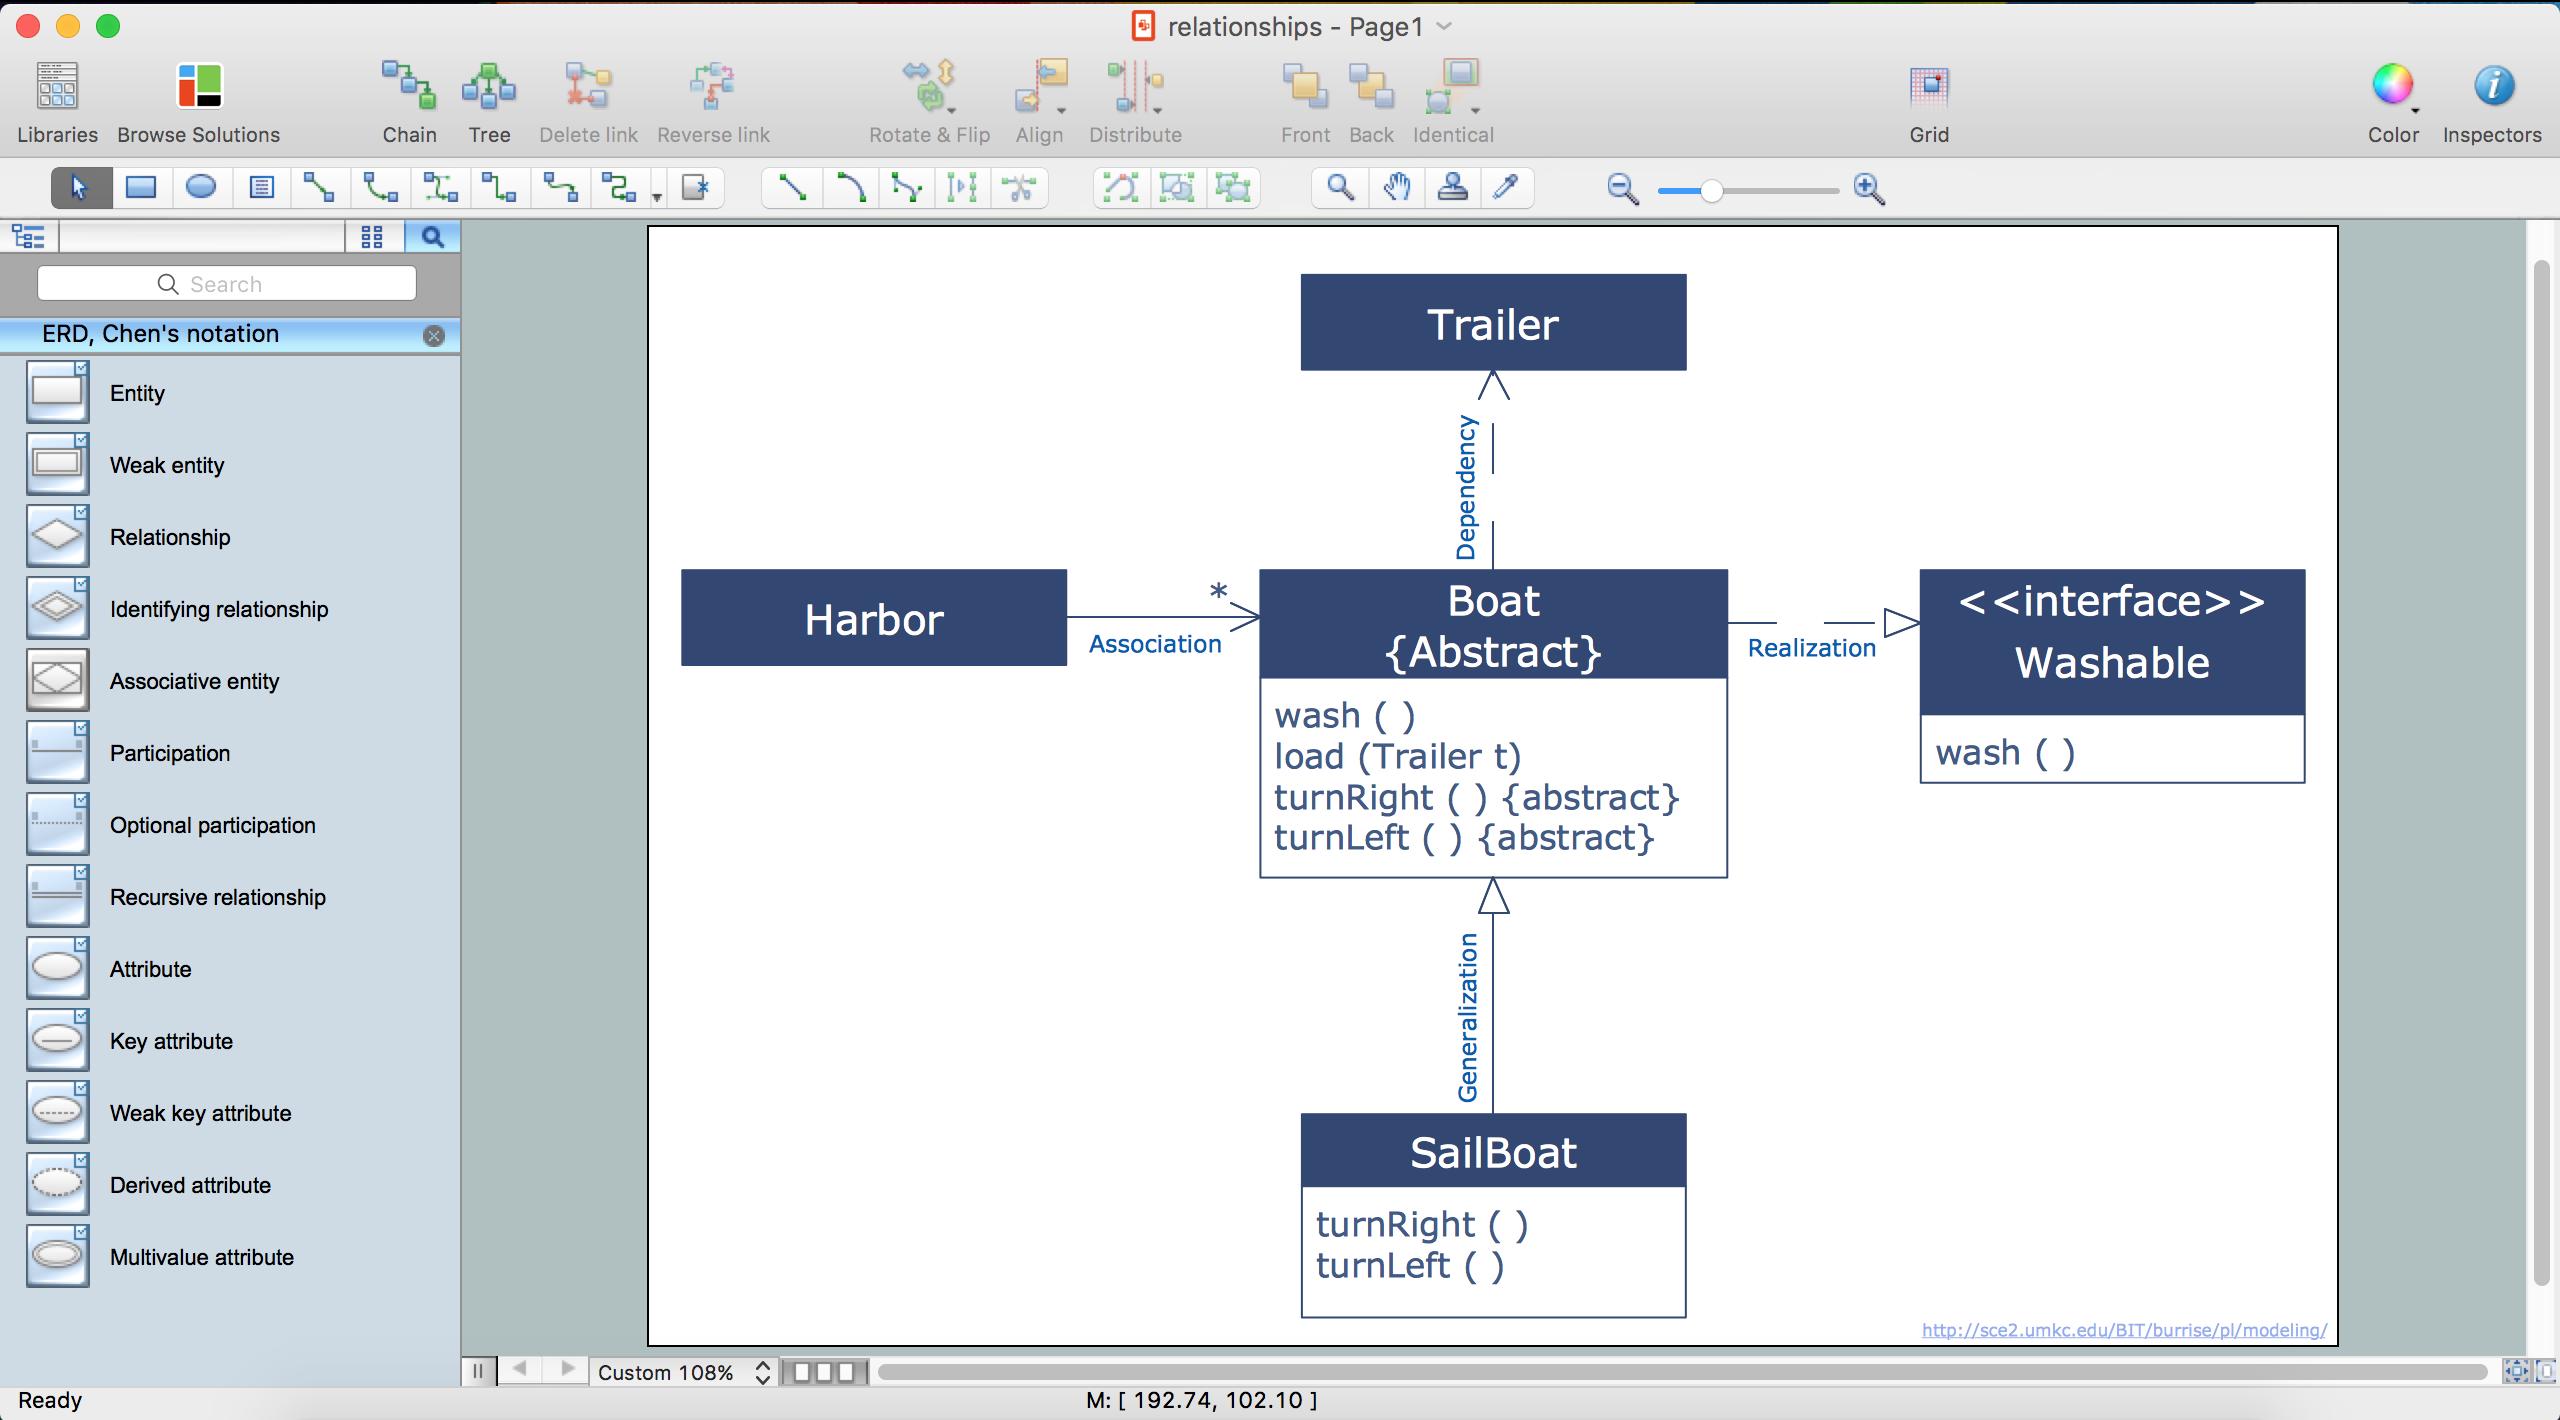 22 Software To Make Er Diagram Ideas Http Bookingritzcarlton Info 22 Software To Make Er Diagram Ideas Relationship Diagram Diagram Diagram Design